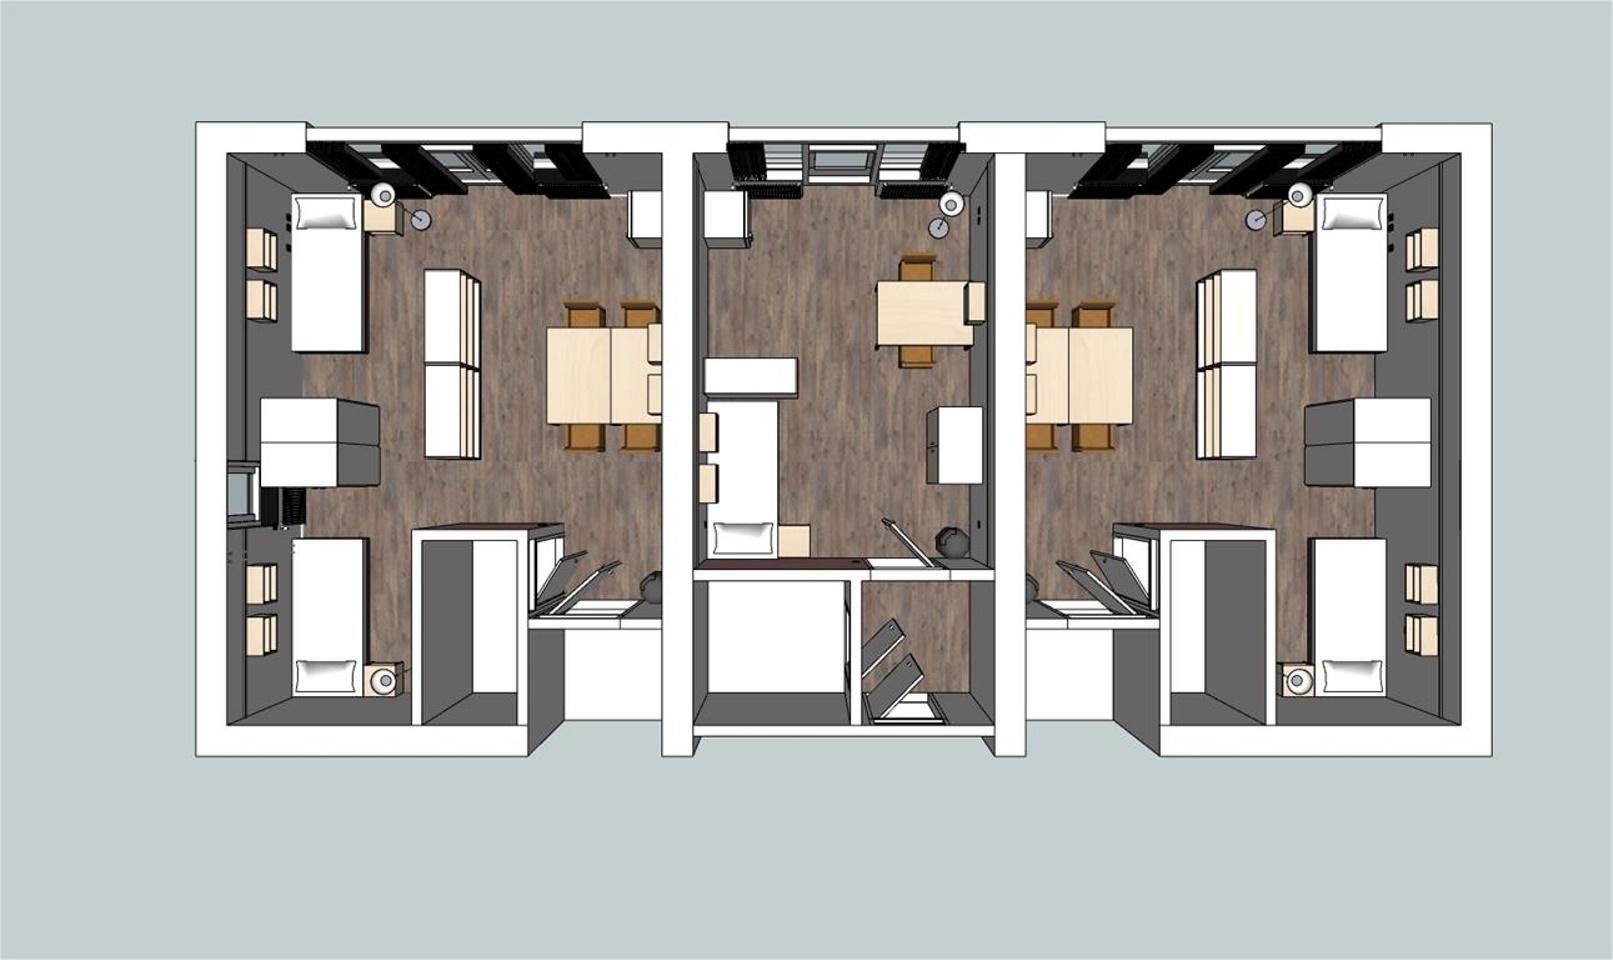 tekening 1 - indeling kamer